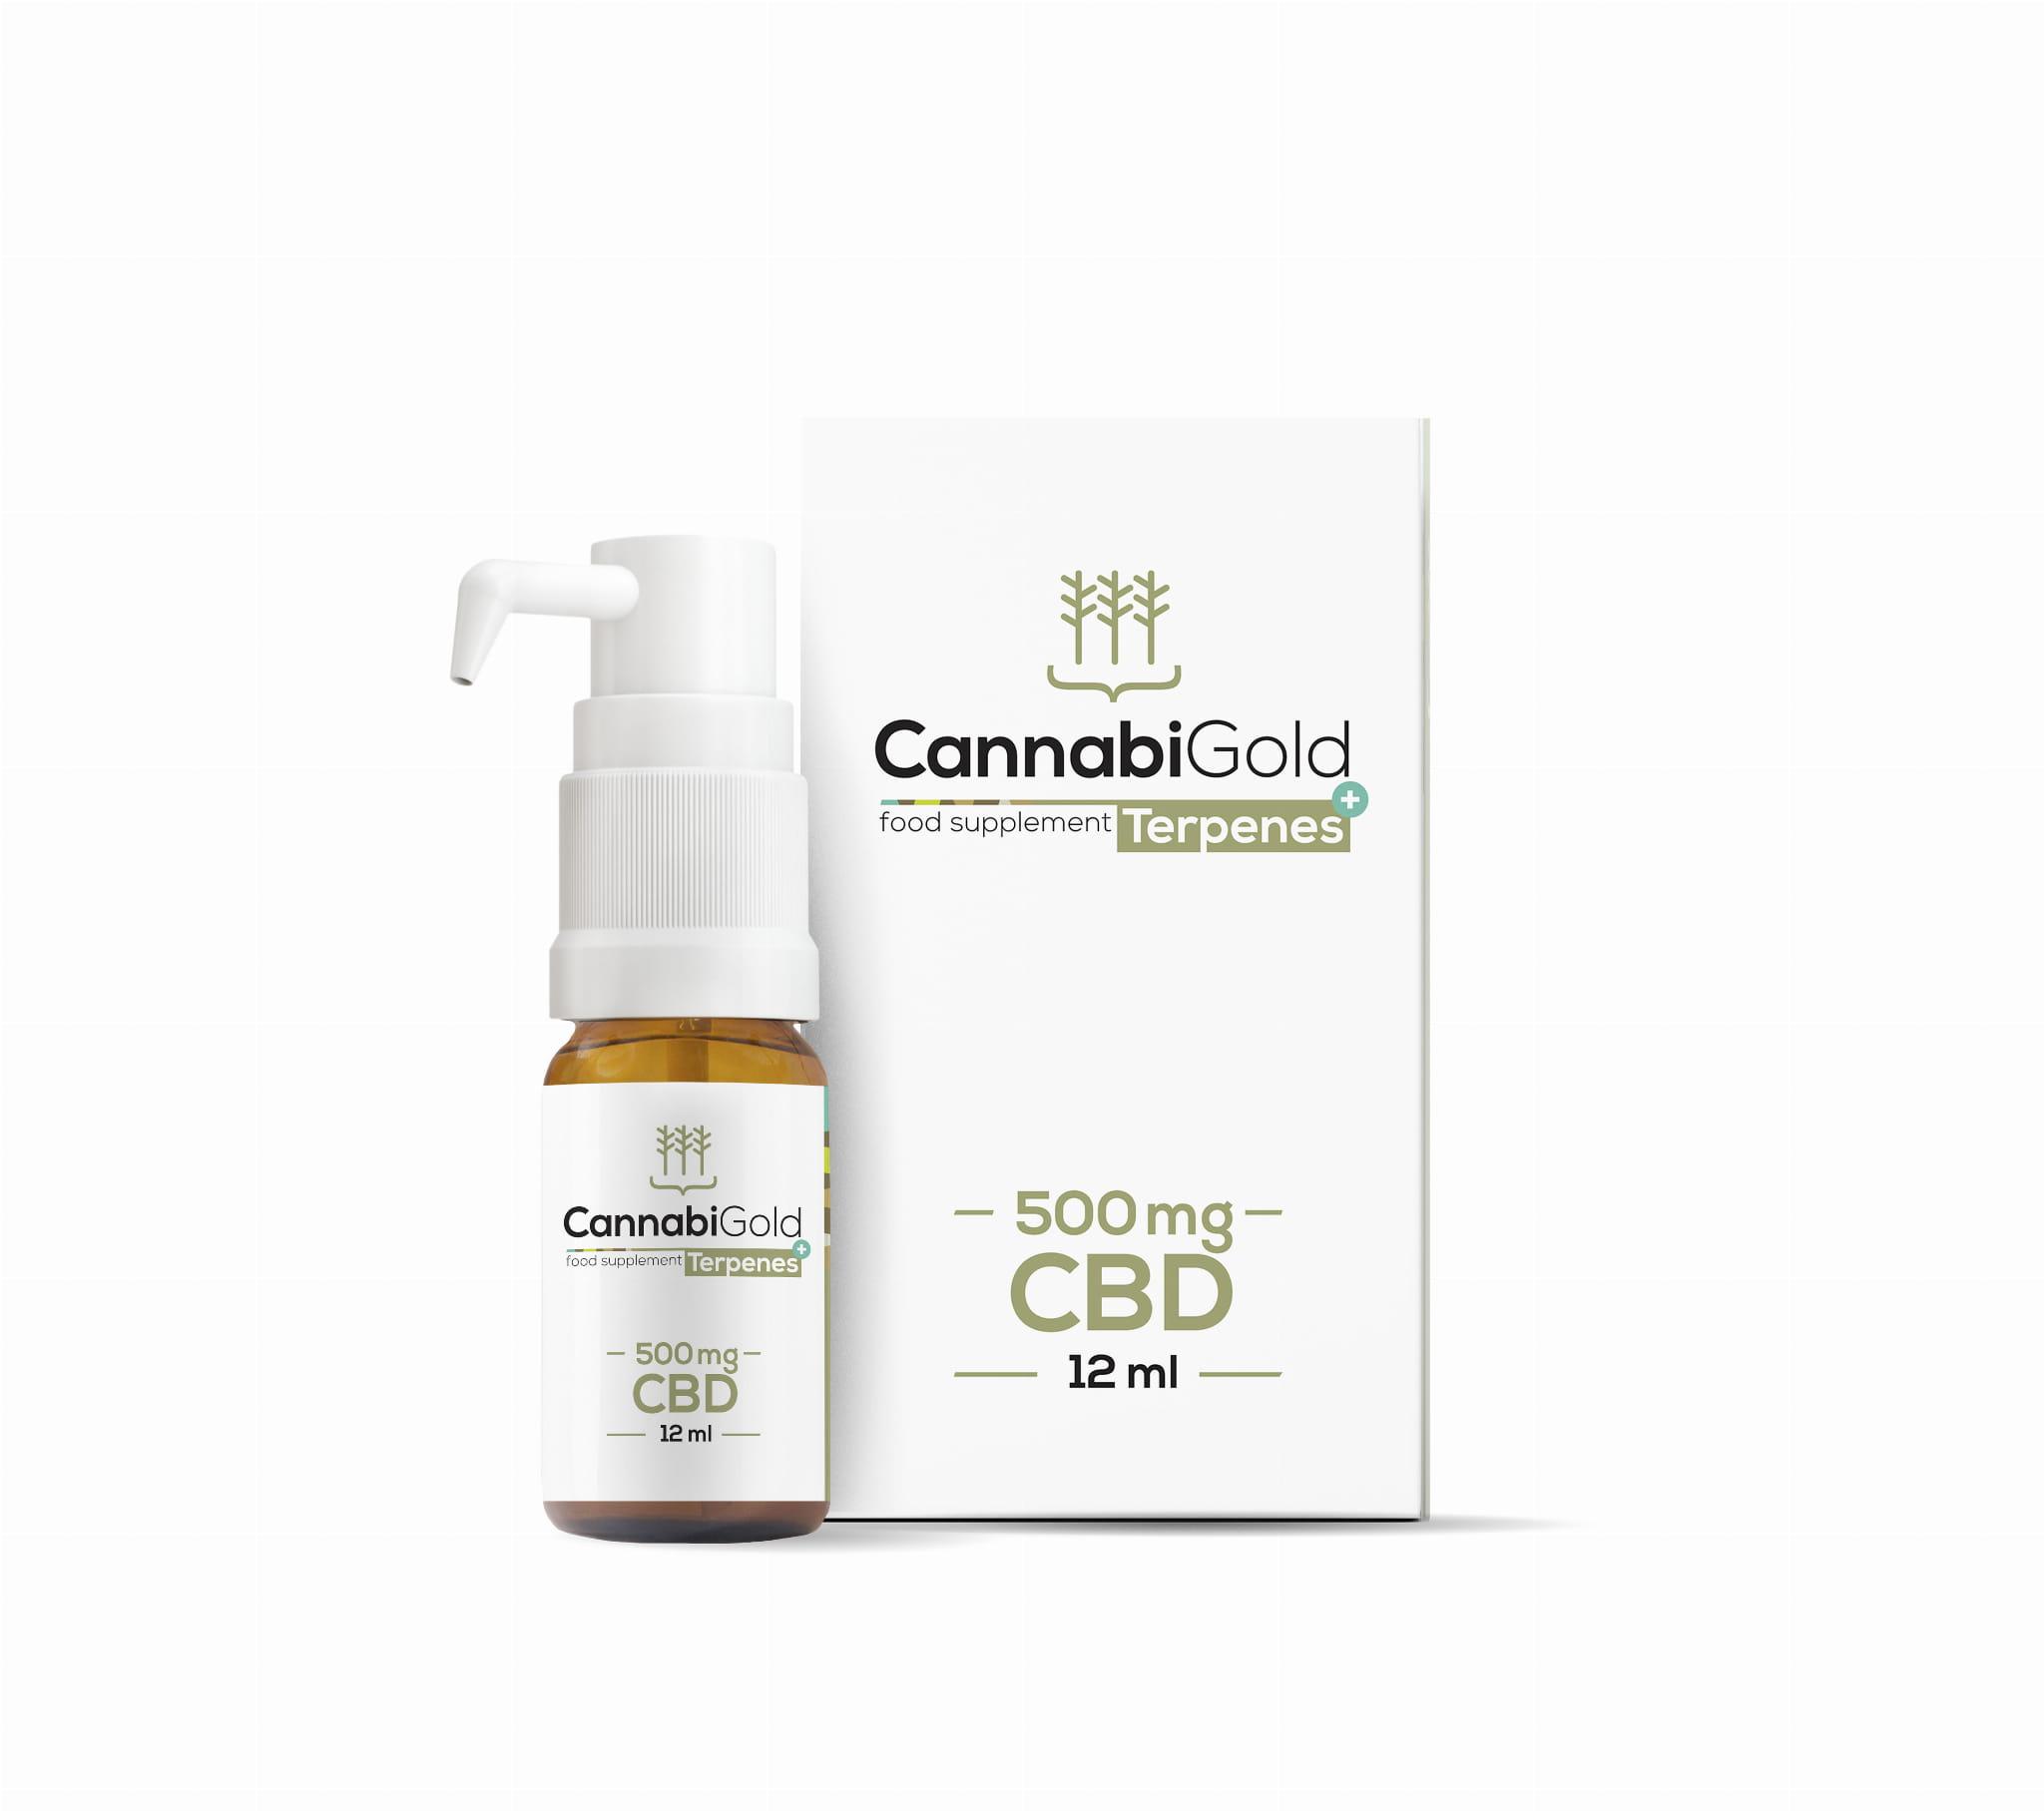 Olejek CBD CannabiGold Terpenes+ Kannabidiol i terpeny w oleju 500mg